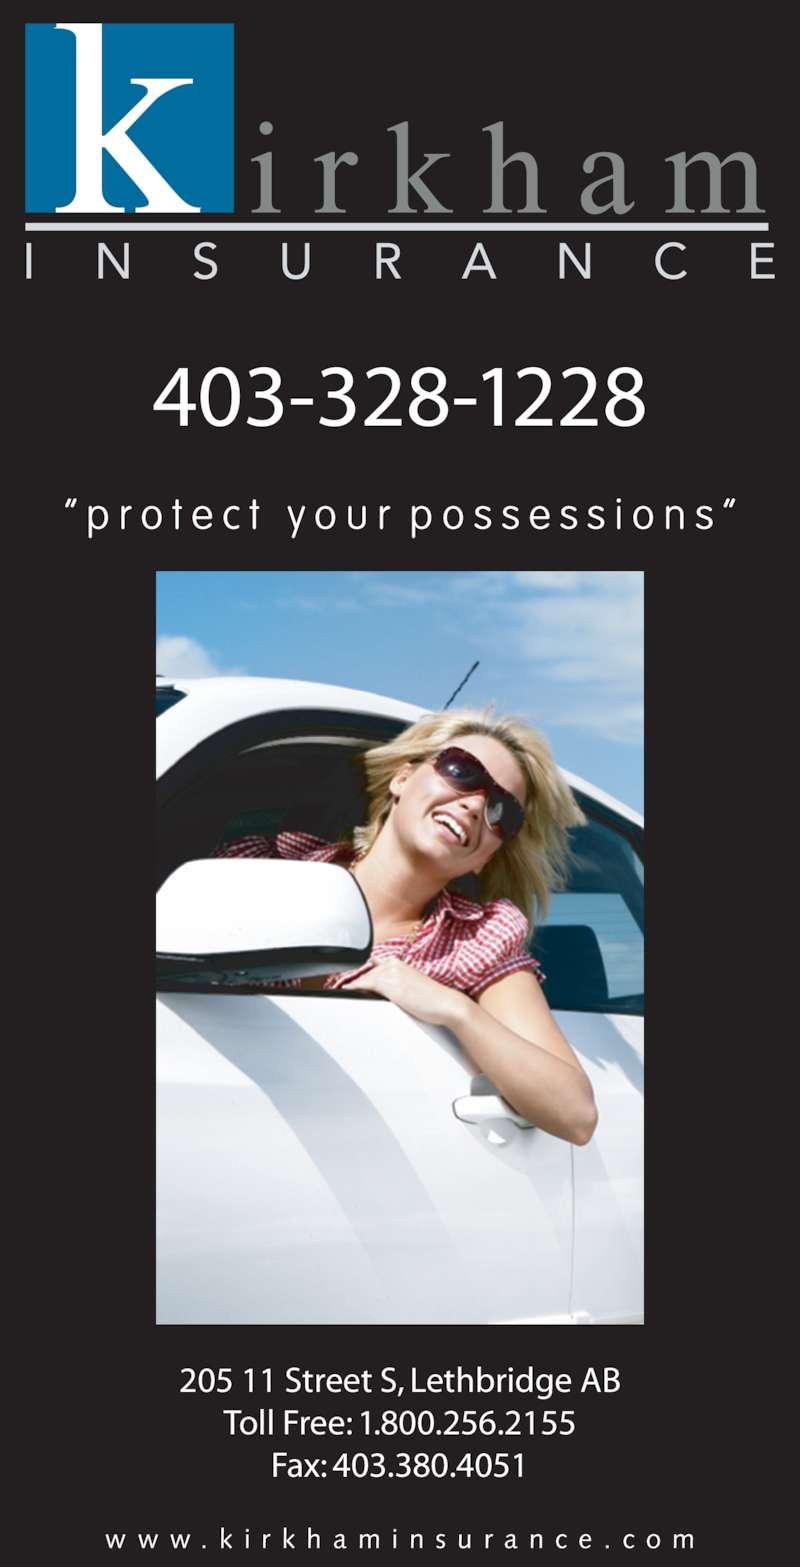 "Kirkham Insurance (403-328-1228) - Display Ad - 205 11 Street S, Lethbridge AB Toll Free: 1.800.256.2155 Fax: 403.380.4051 w w w . k i r k h a m i n s u r a n c e . c o m 403-328-1228 "" p r o t e c t  y o u r  p o s s e s s i o n s """